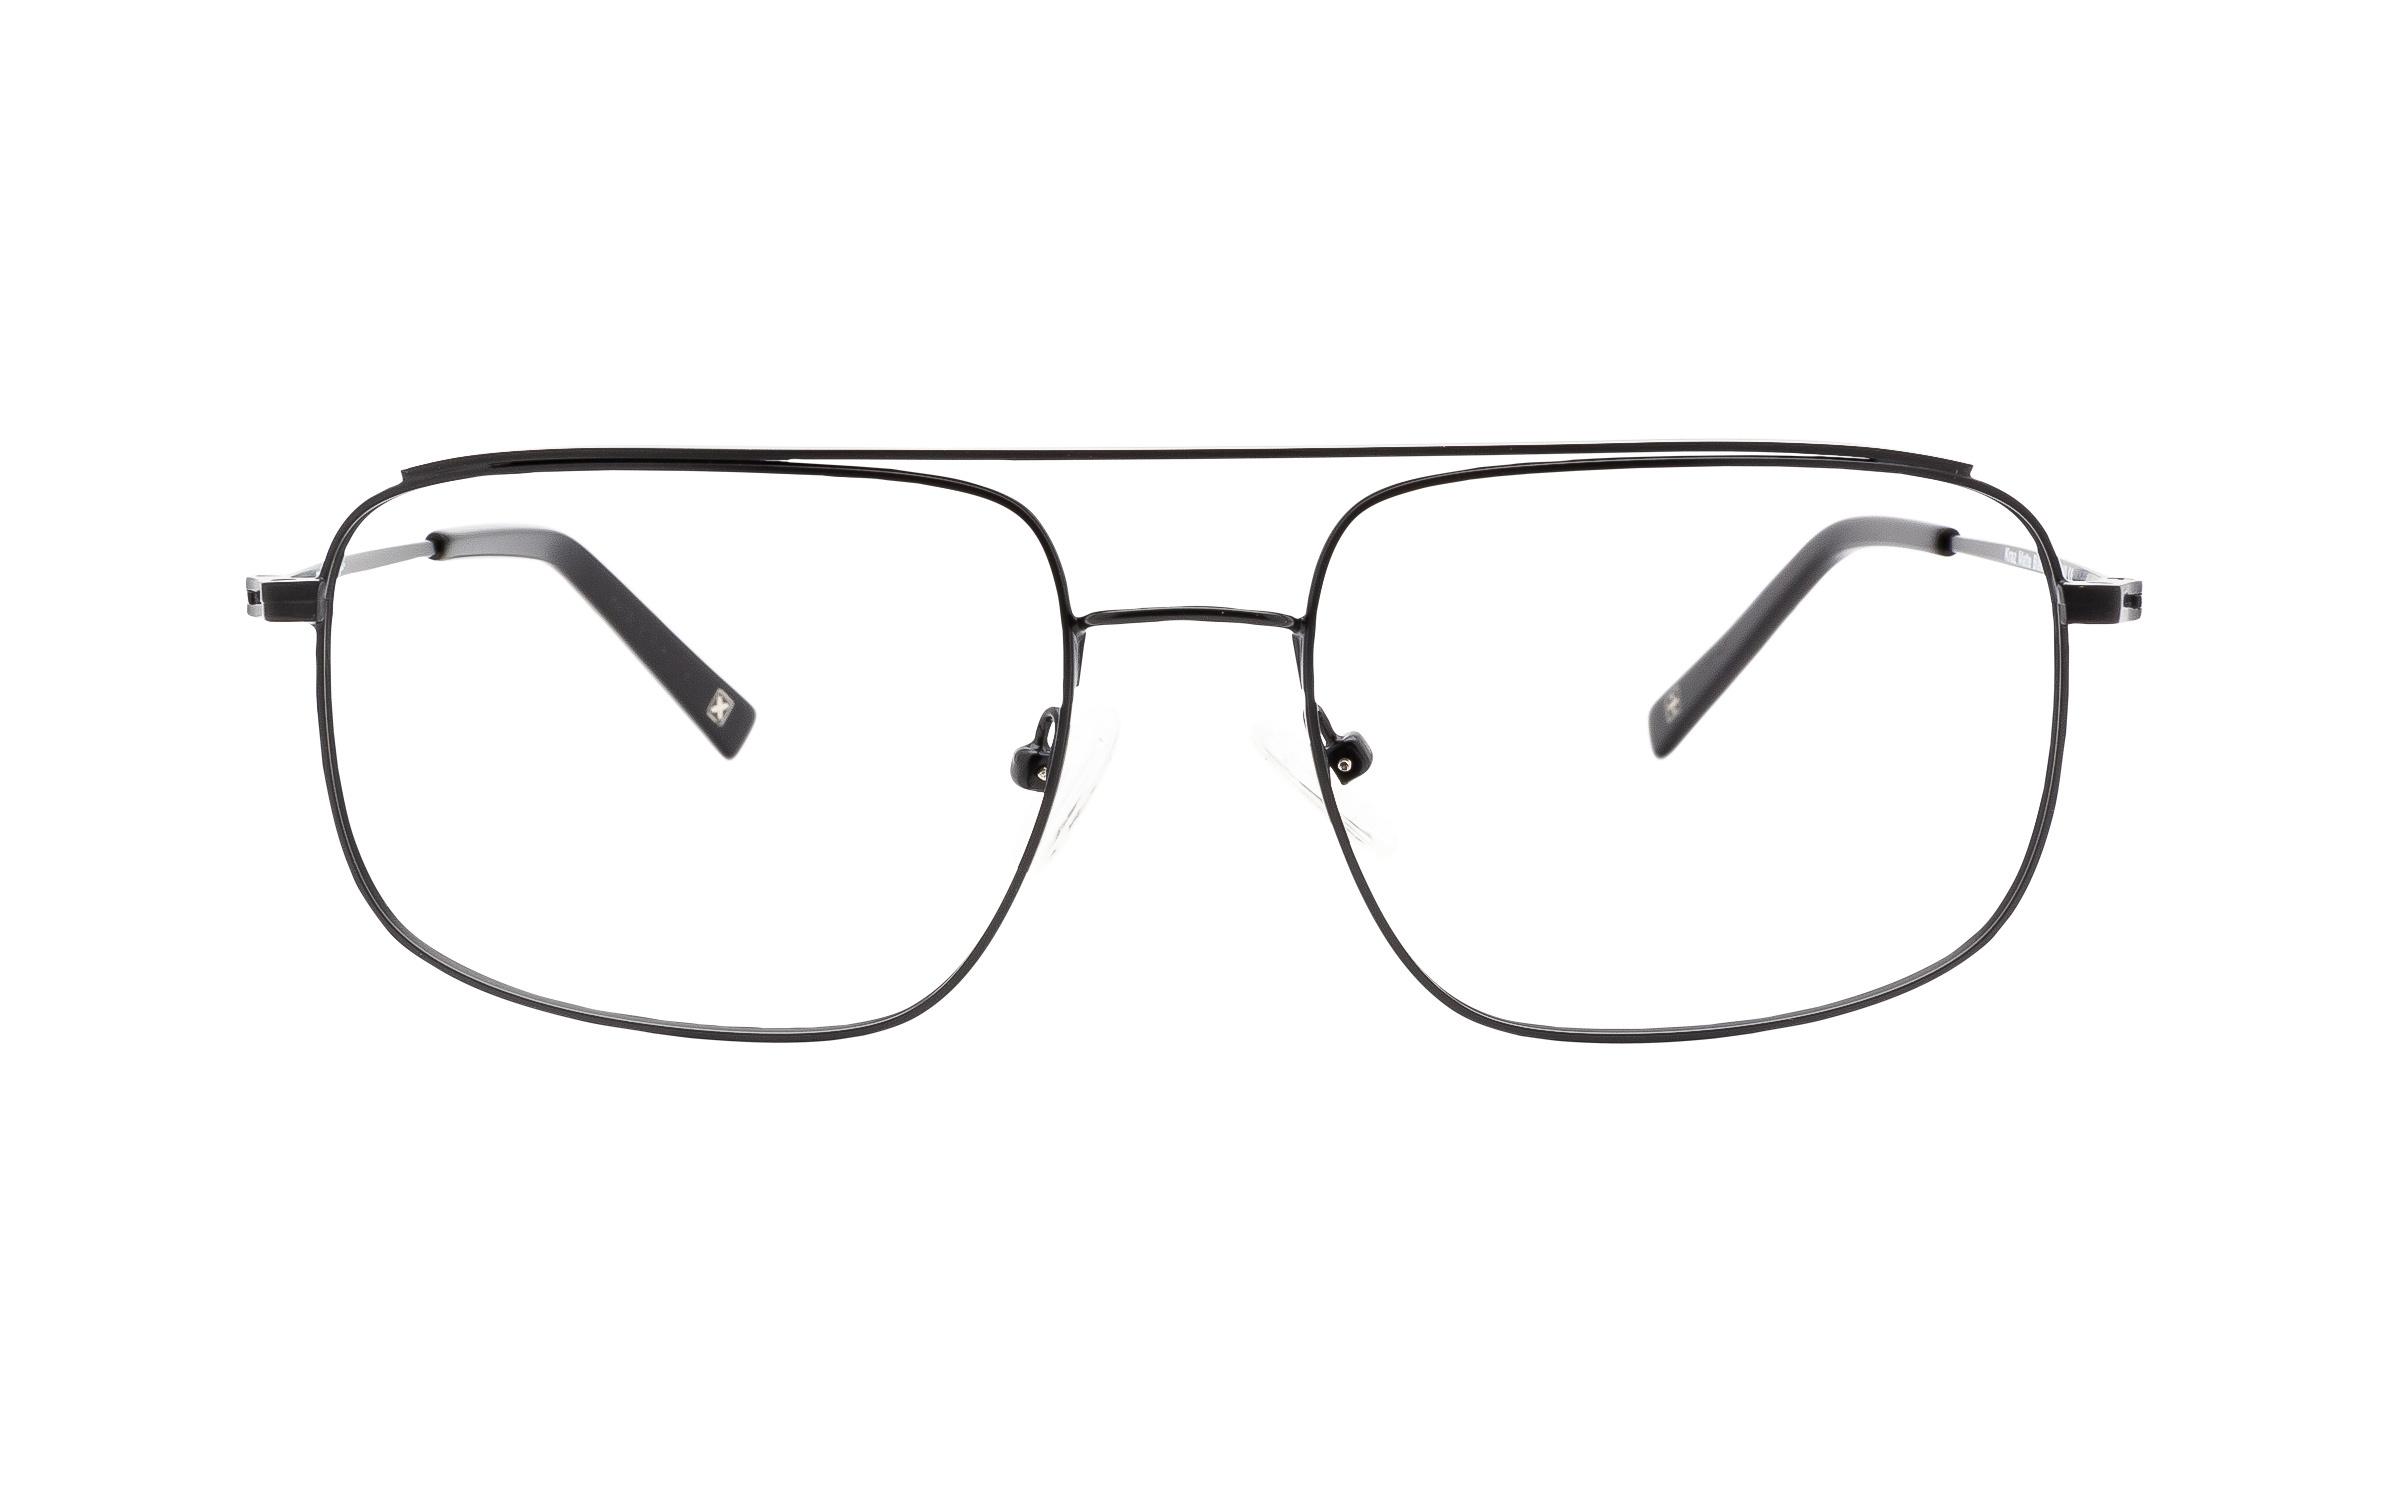 http://www.coastal.com/ - Derek Cardigan Kraz DC221 C01 (55) Eyeglasses and Frame in Matte Black | Metal – Online Coastal